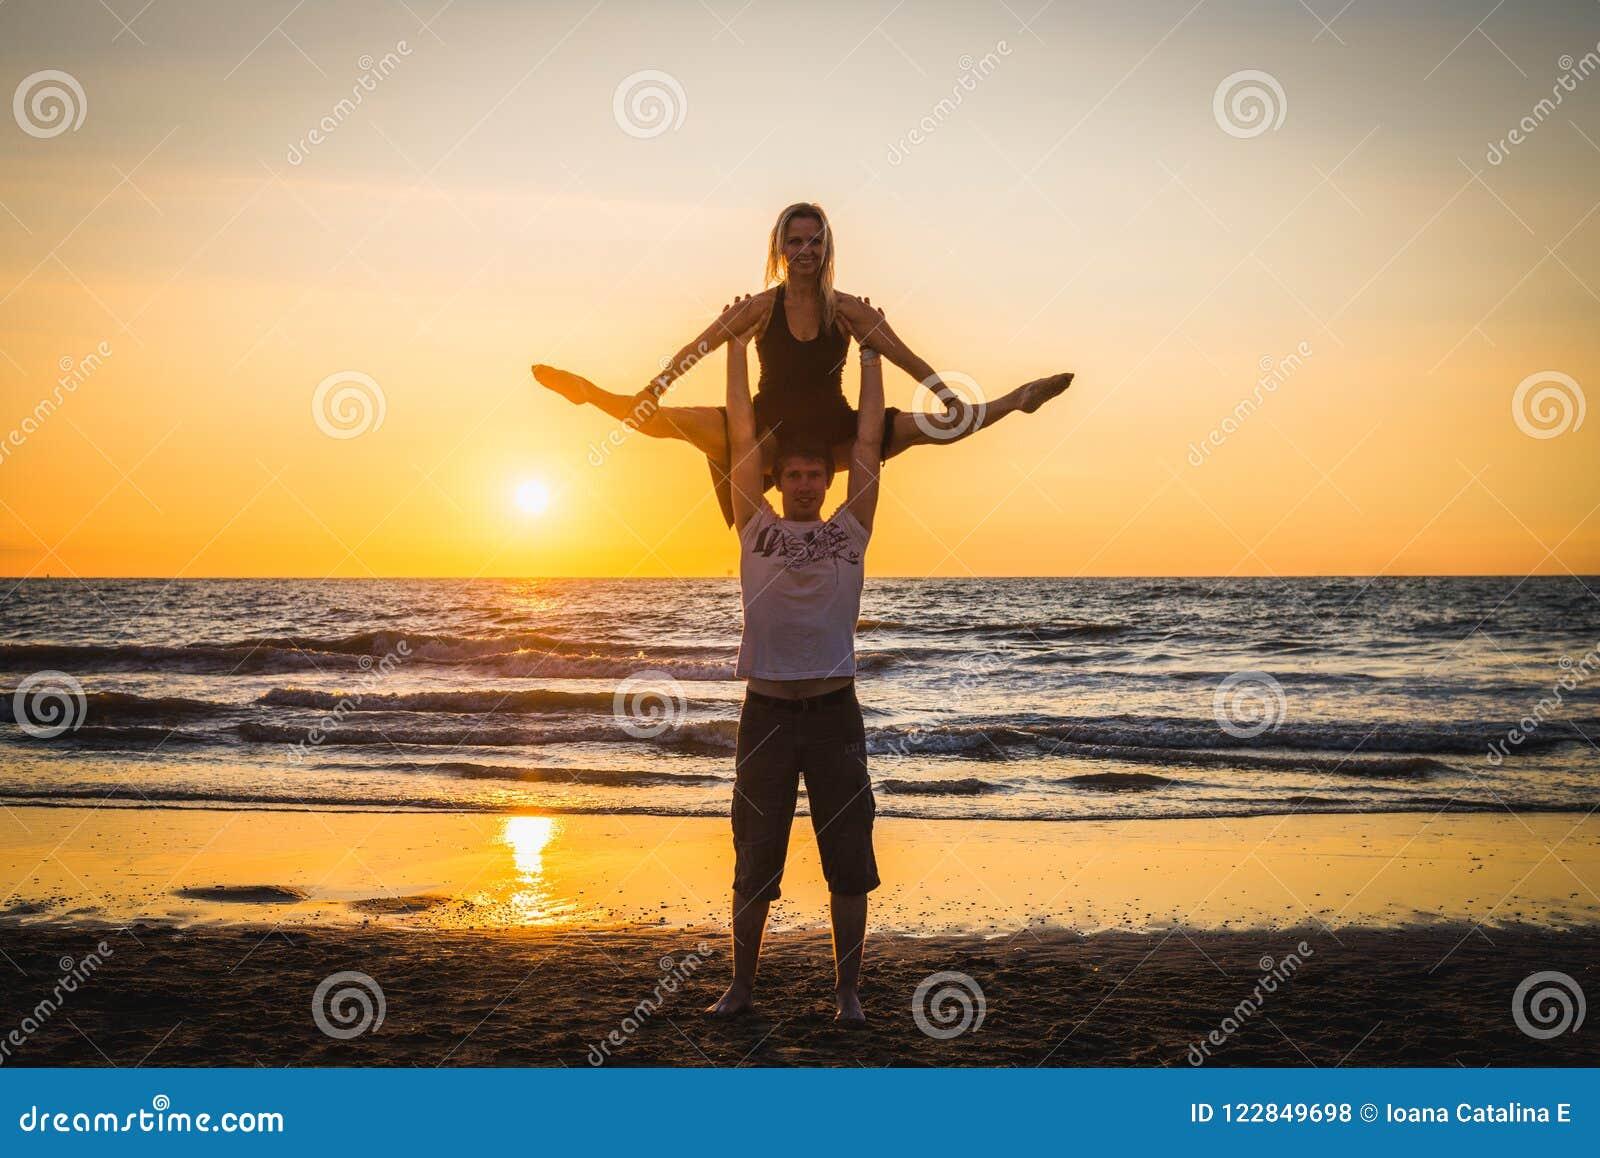 Konturer av två dansare som gör akrobatik på solnedgången